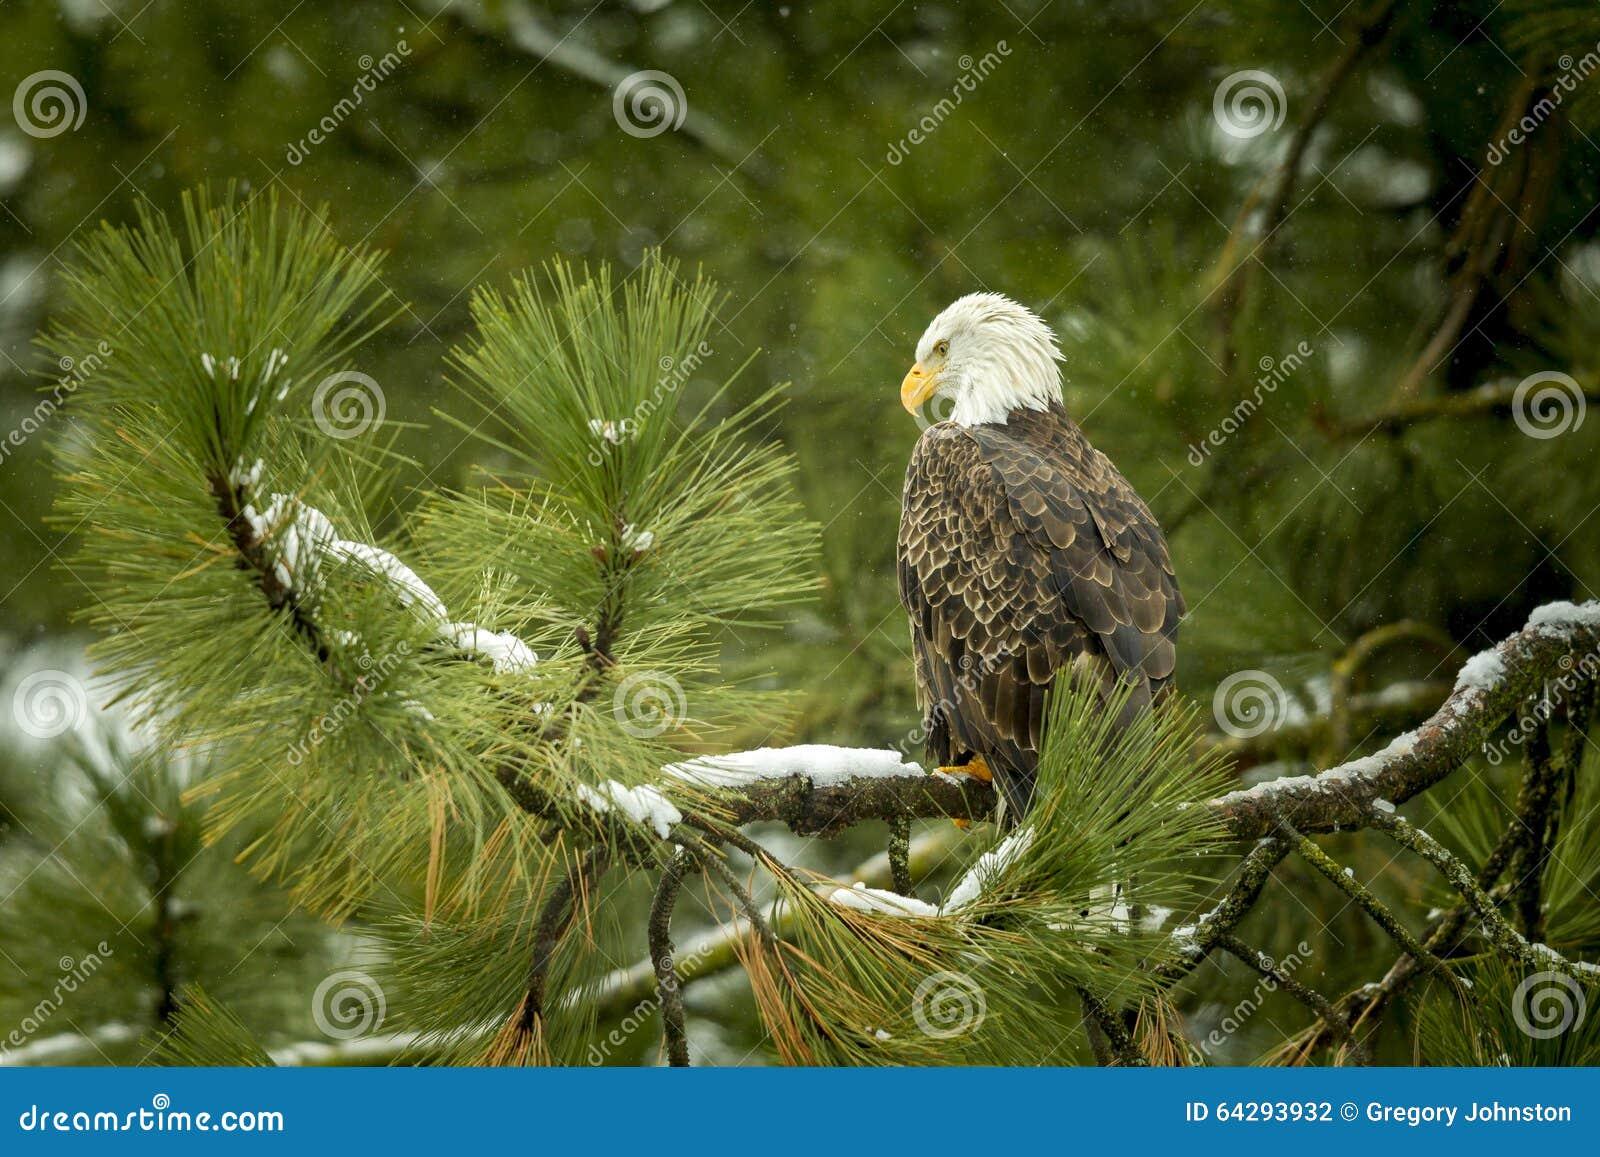 Majestic eagle in tree.